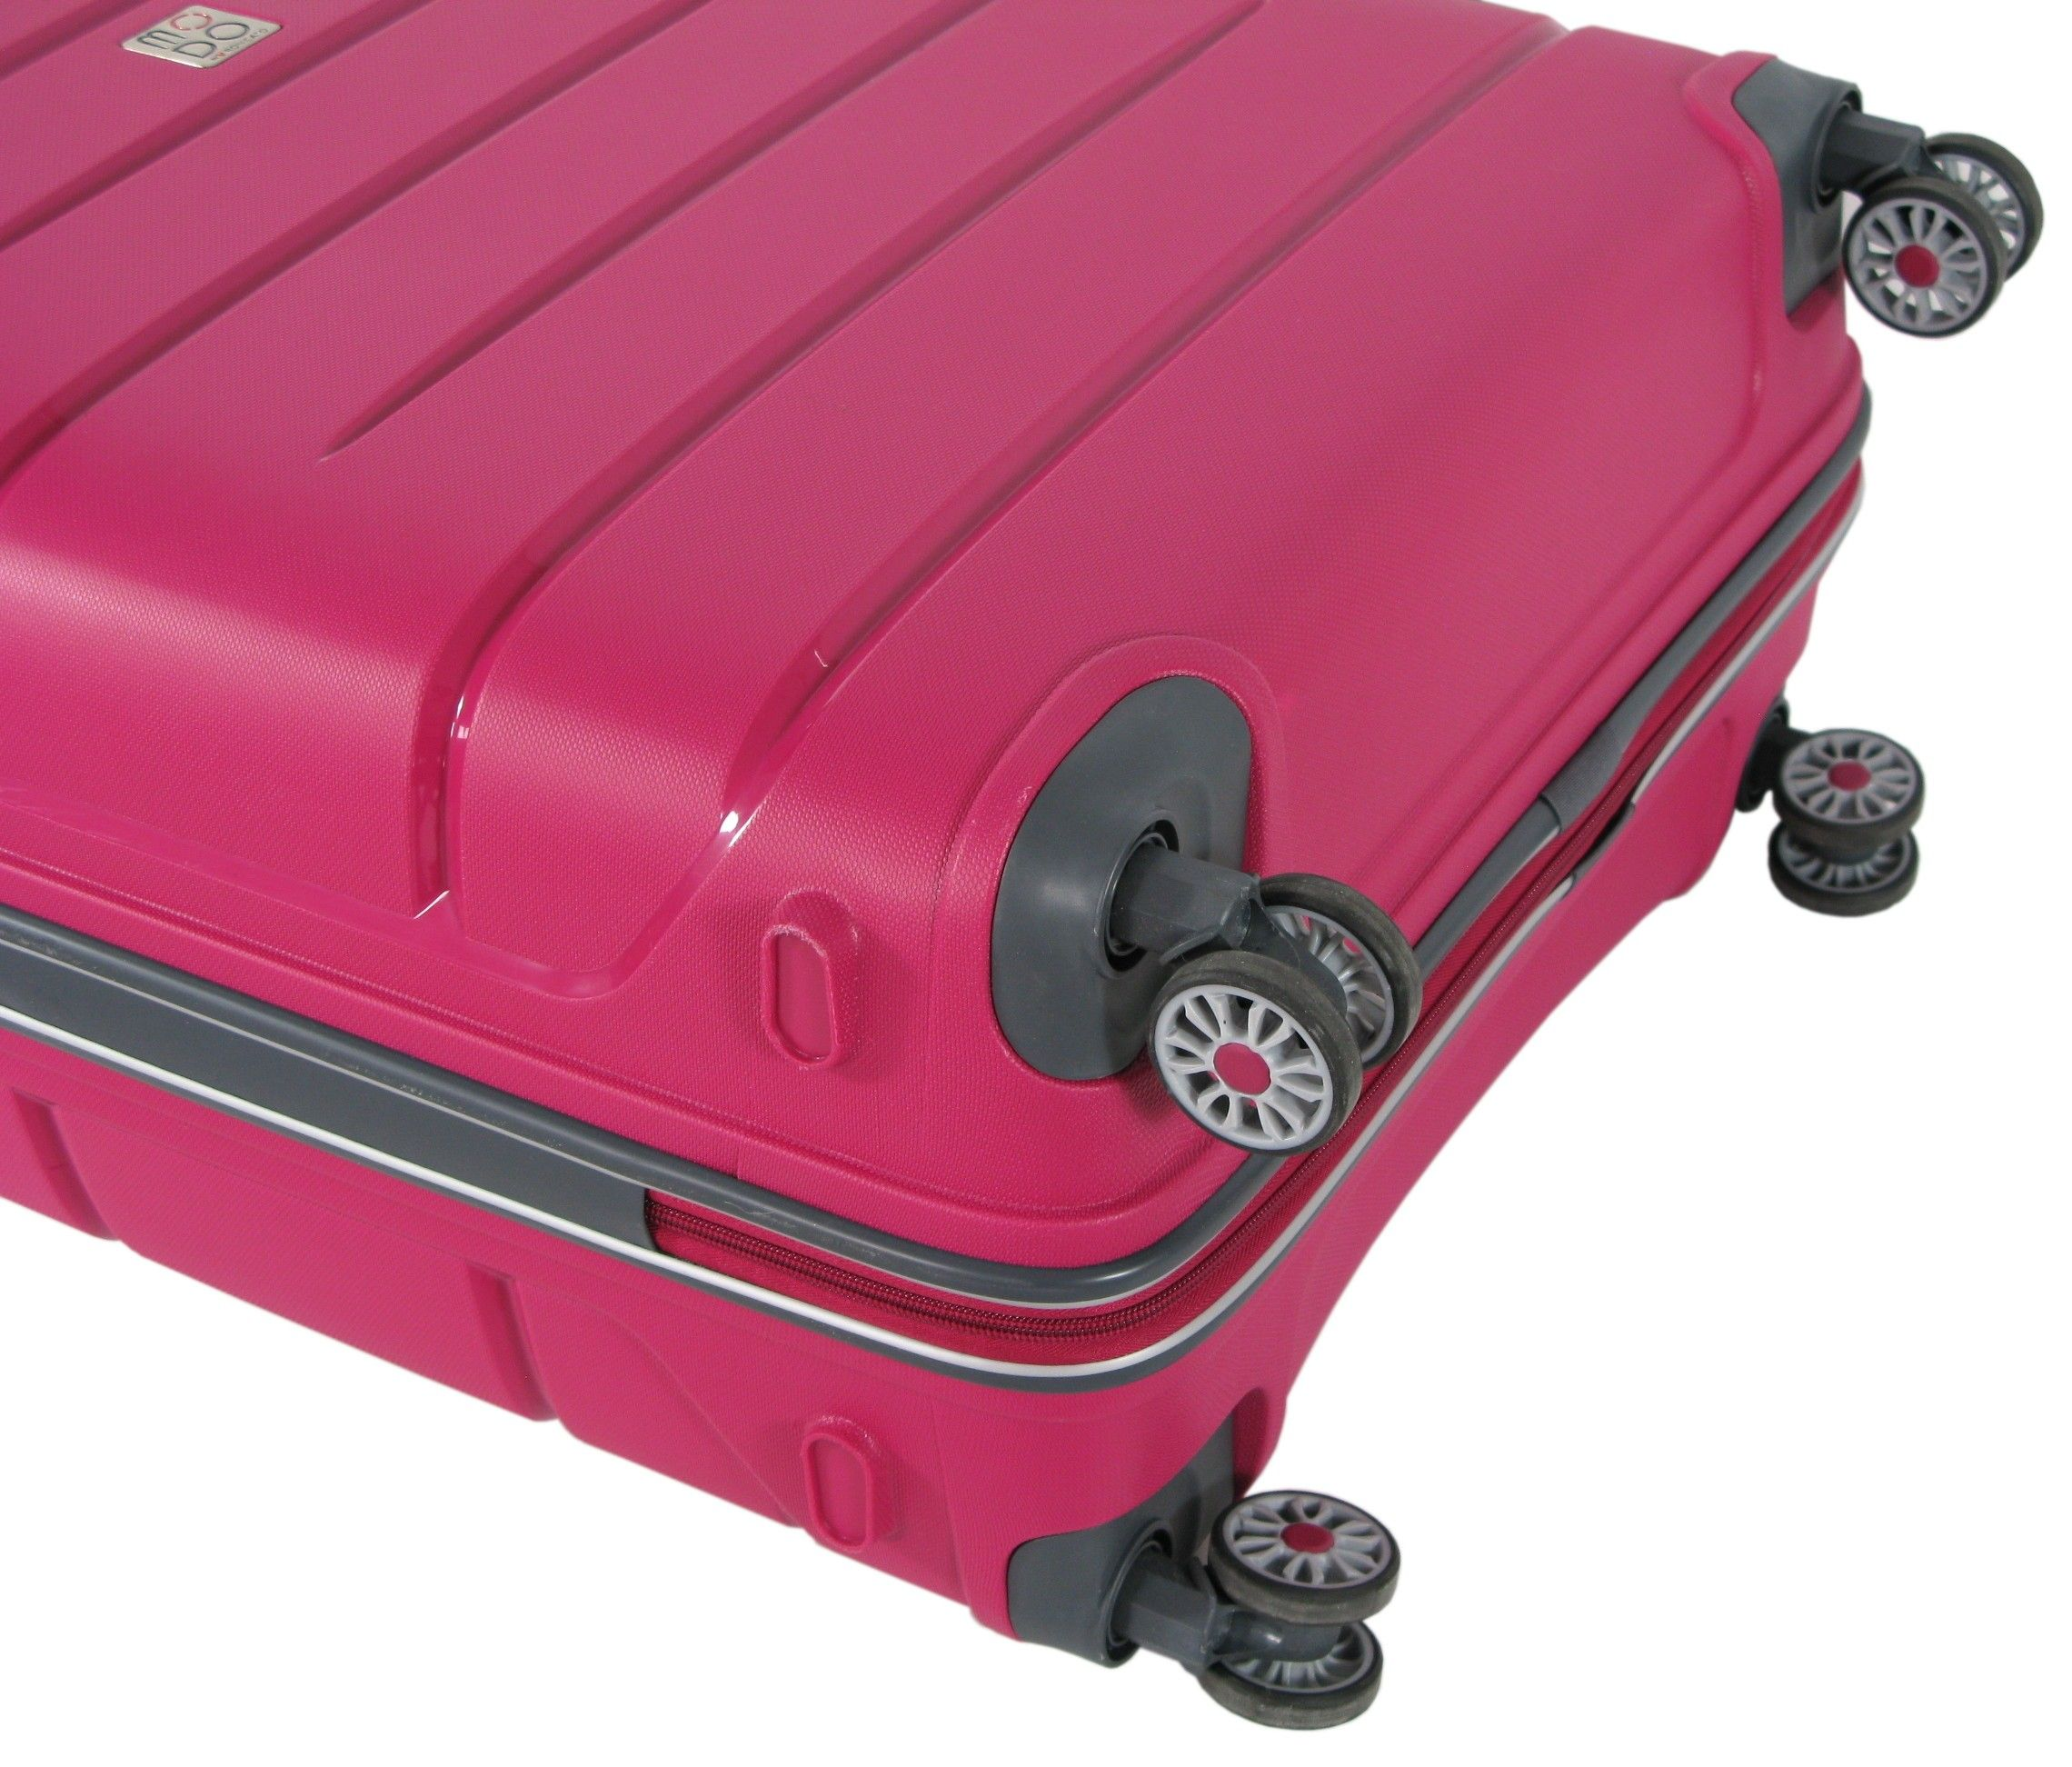 b2dd0f769333 Duża walizka na kółkach RONCATO MODO zamek TSA różowa